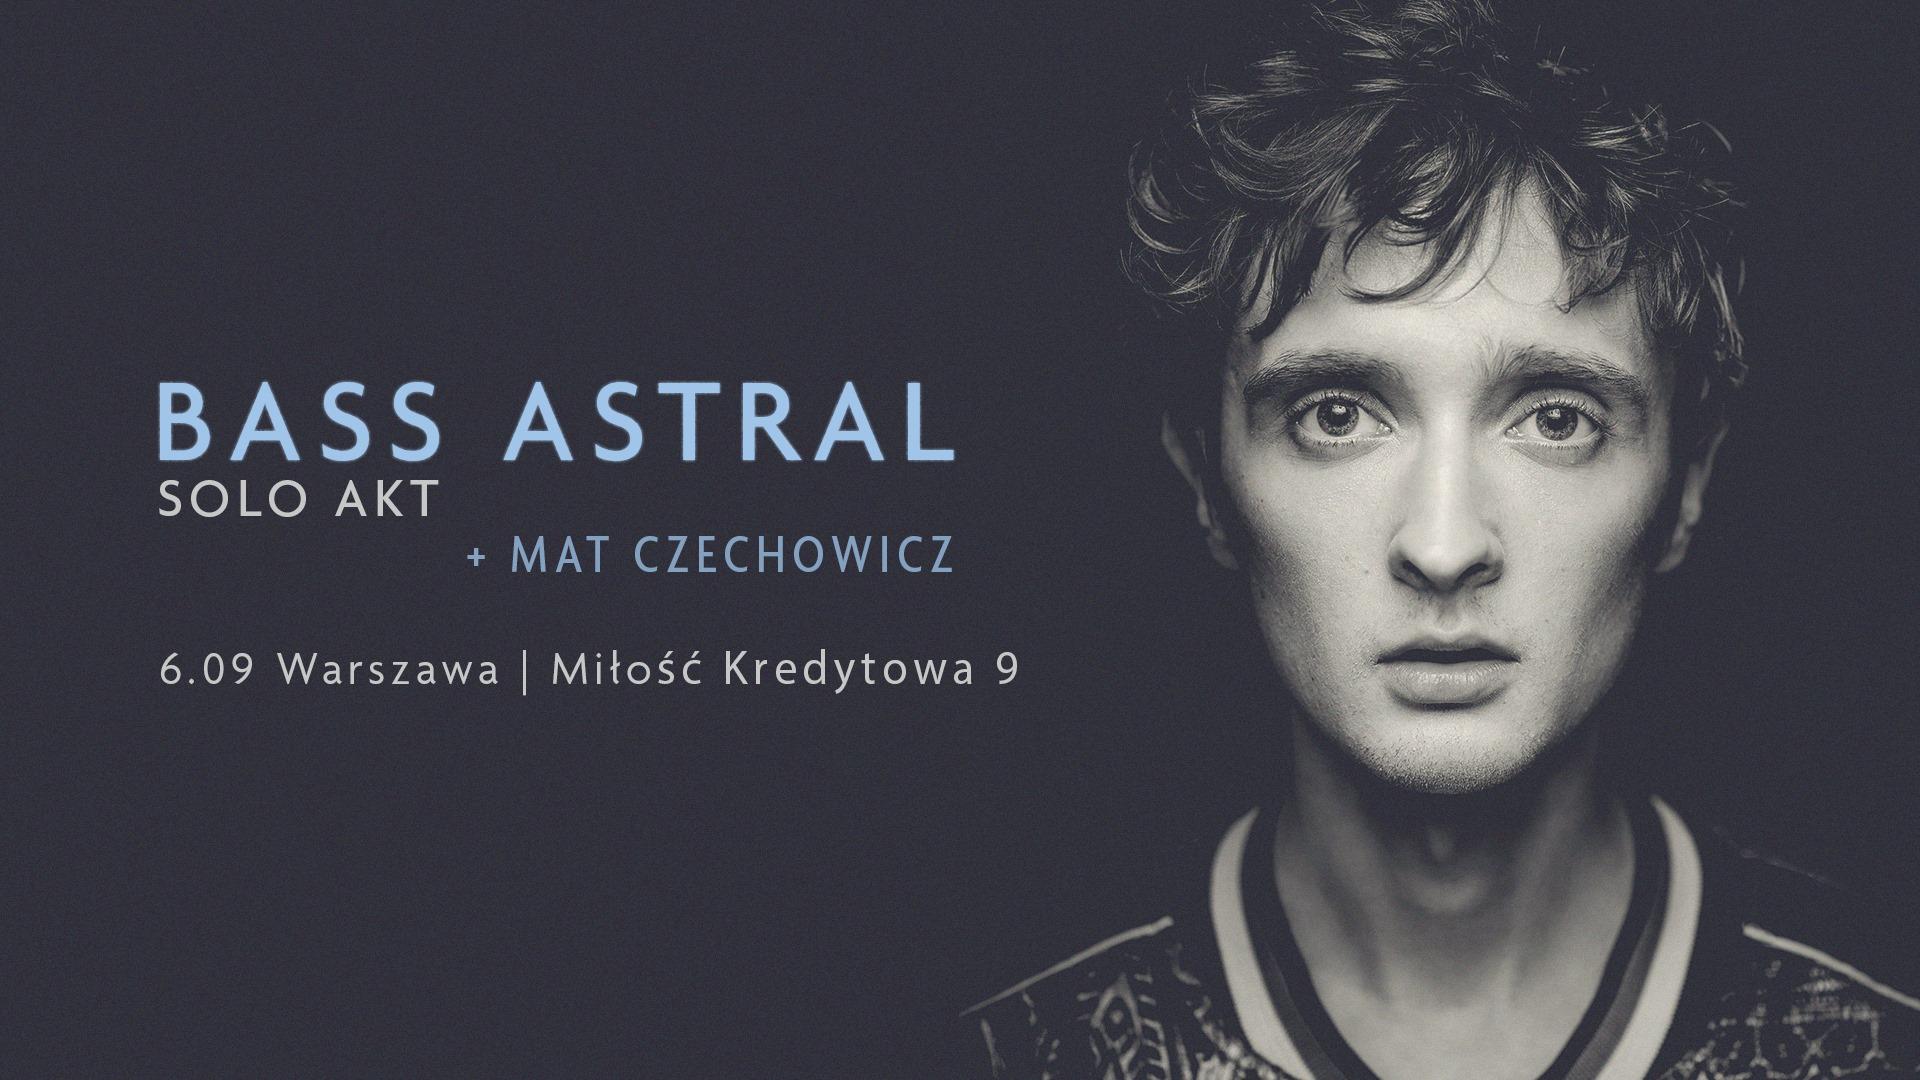 Bass Astral Solo Akt Mat Czechowicz 6.09 Warszawa